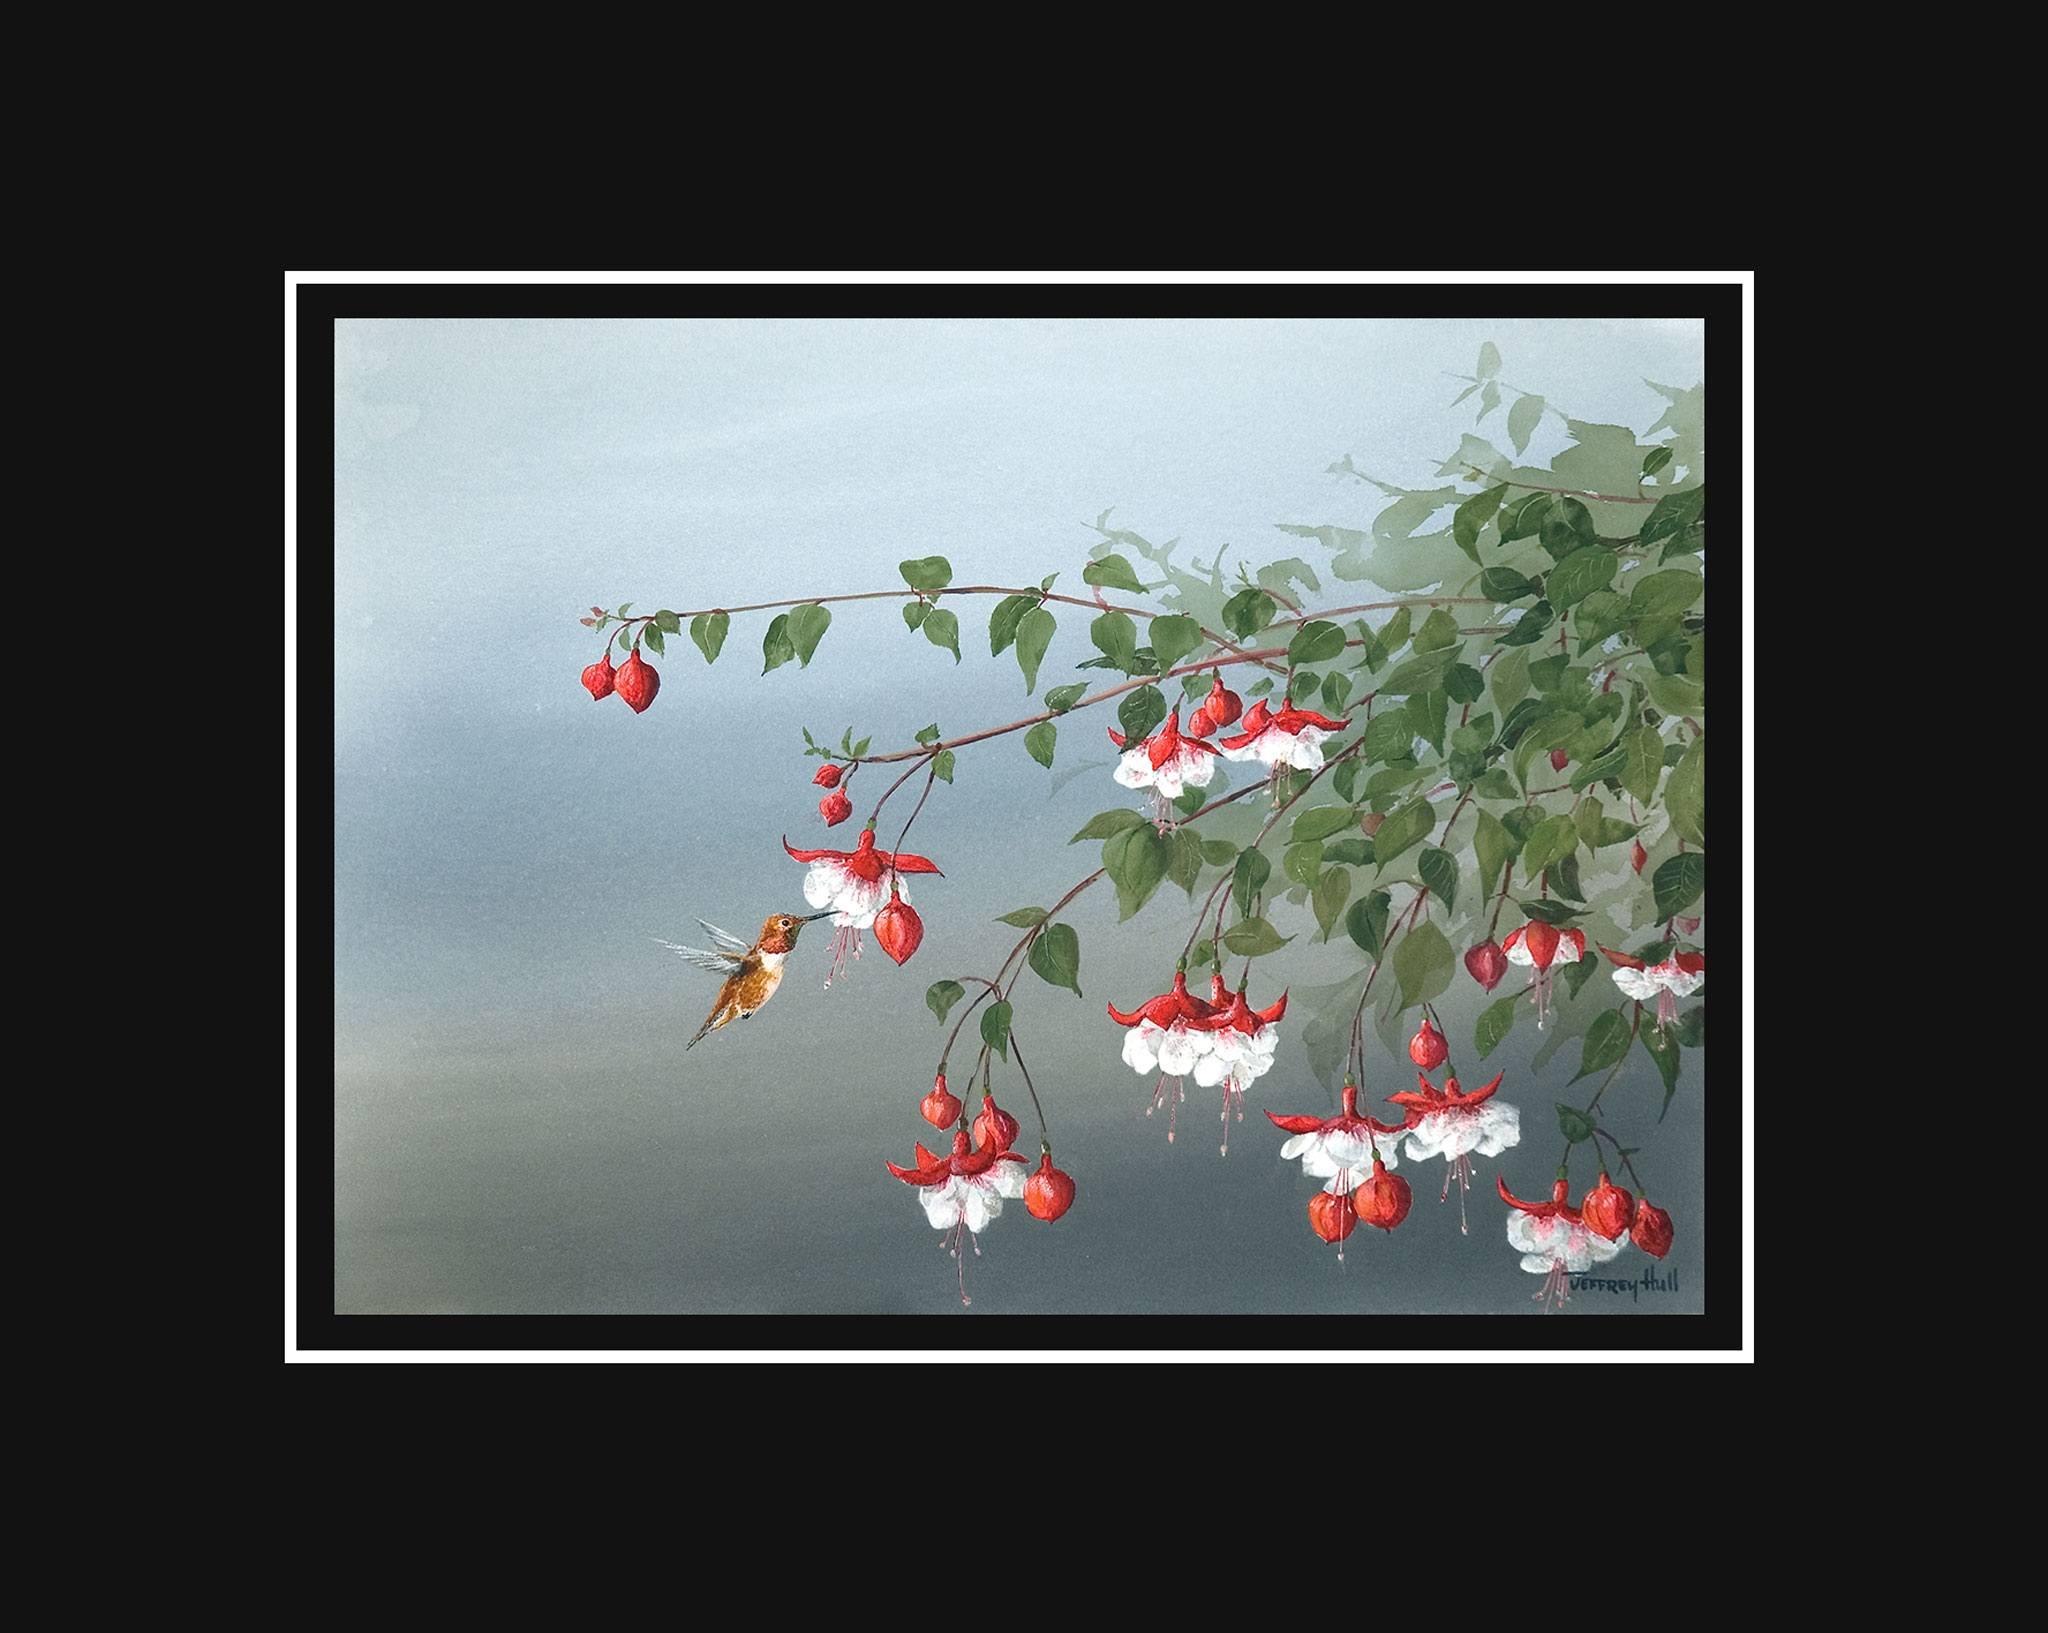 Fuchsia-Blossoms-Mini-Unframed-Jet-Black-4-Website-2021